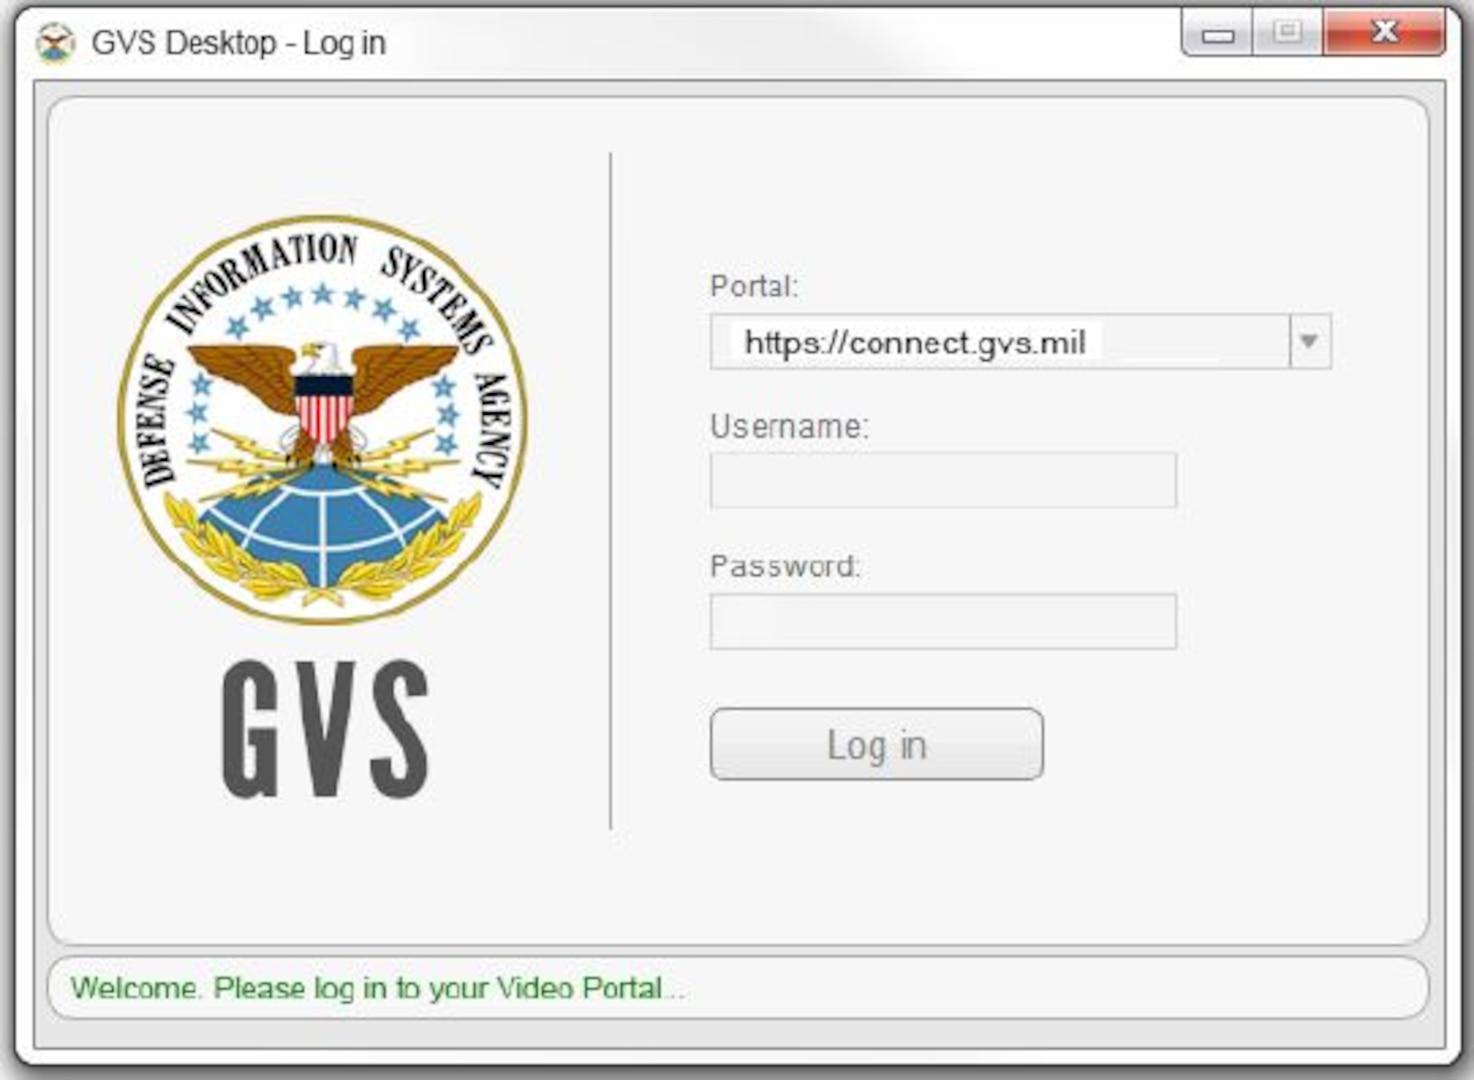 Computer screenshot of a login dialogue box